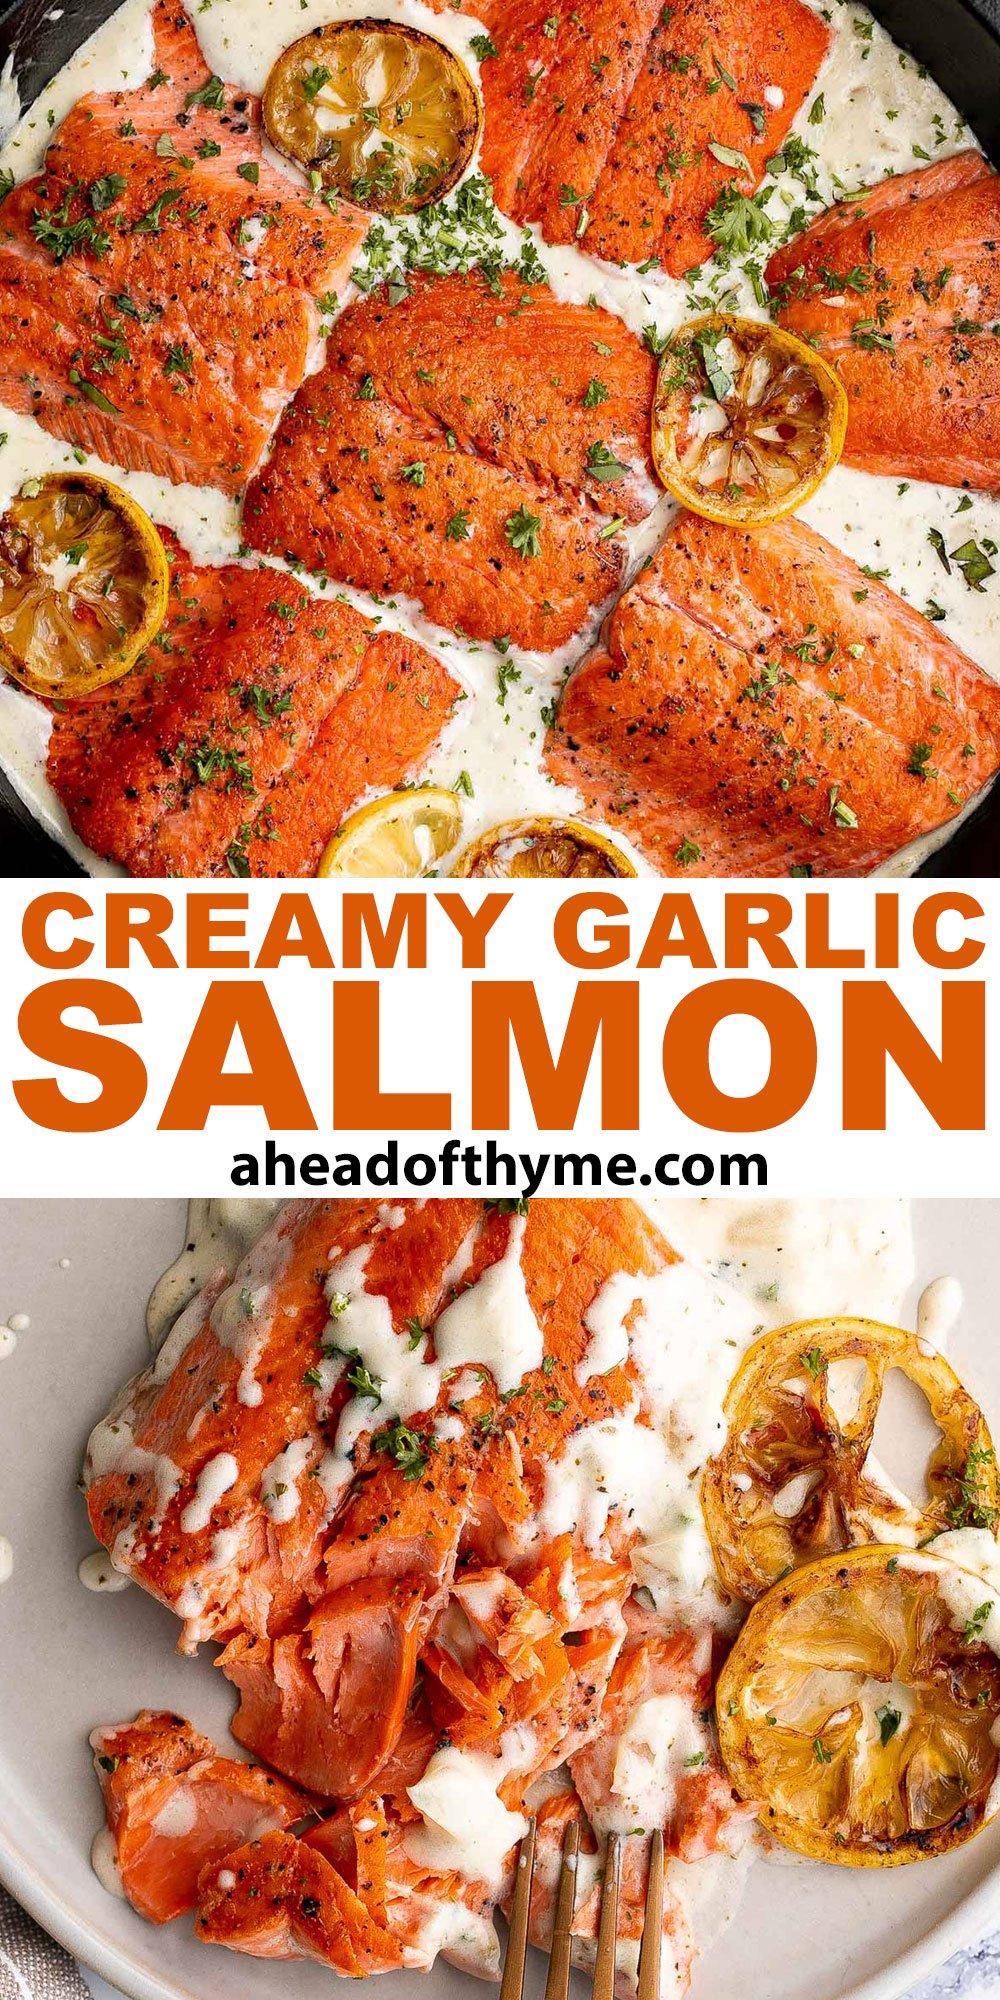 Creamy Garlic Salmon